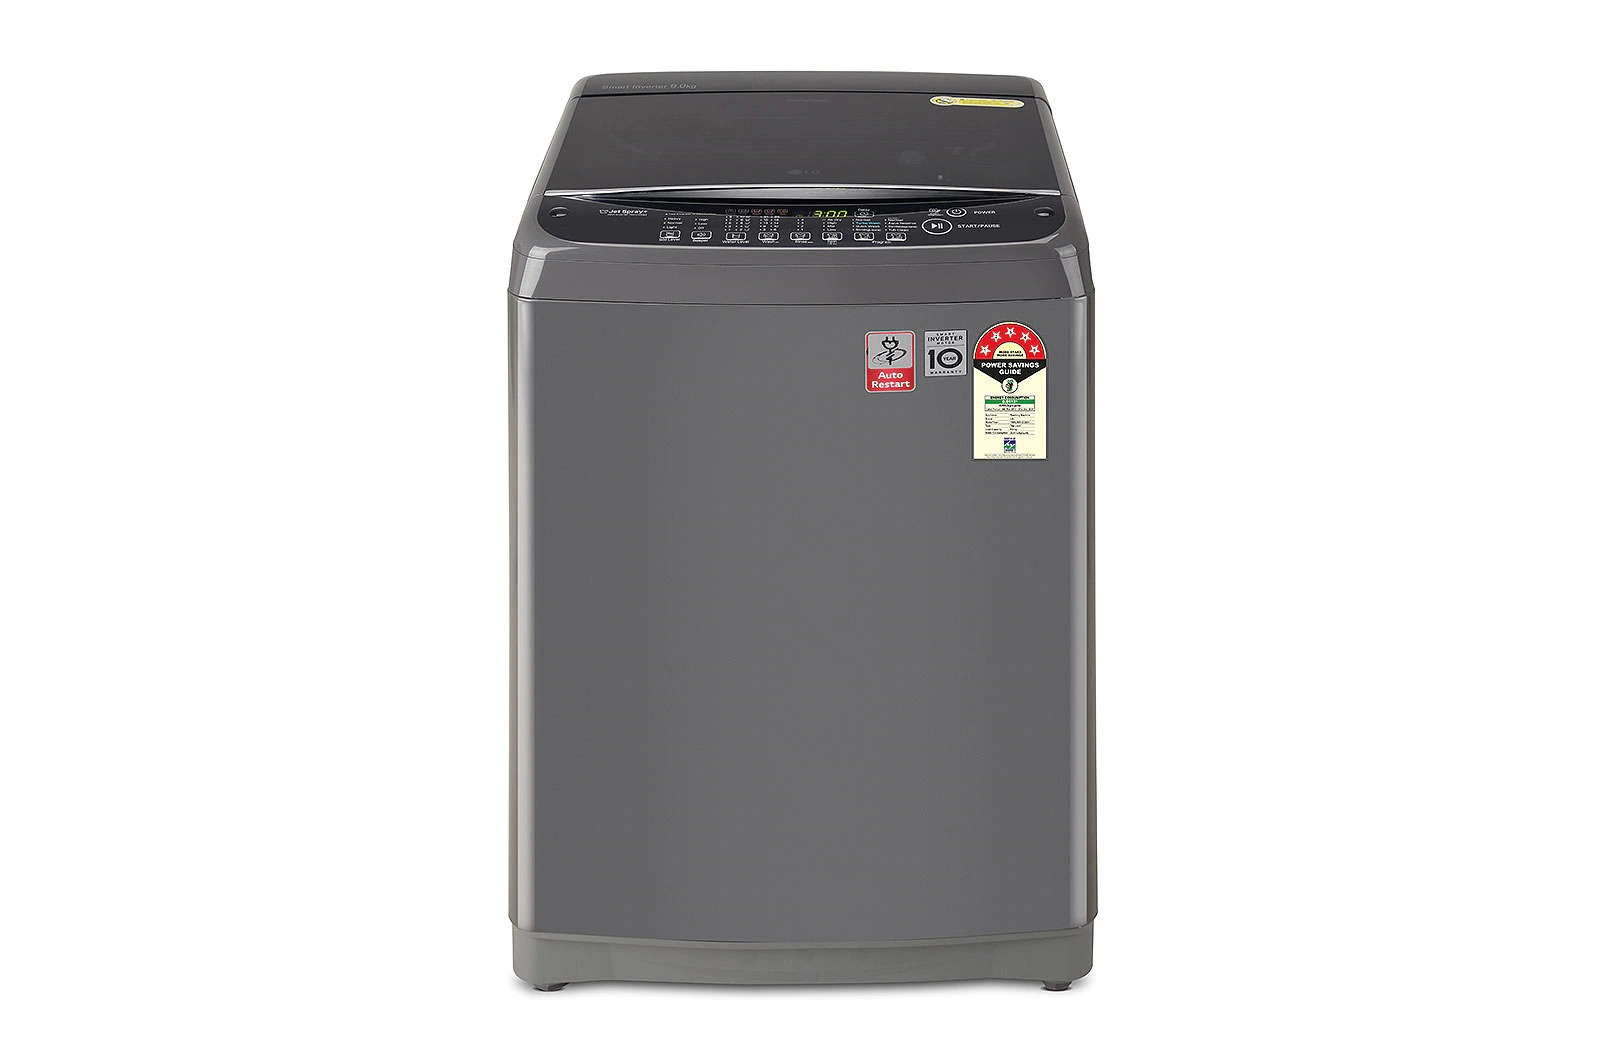 LG (T90SJMB1Z) 9.0kg, 5 Star, Middle Black, Jet Spray+, Punch+3, TurboDrum